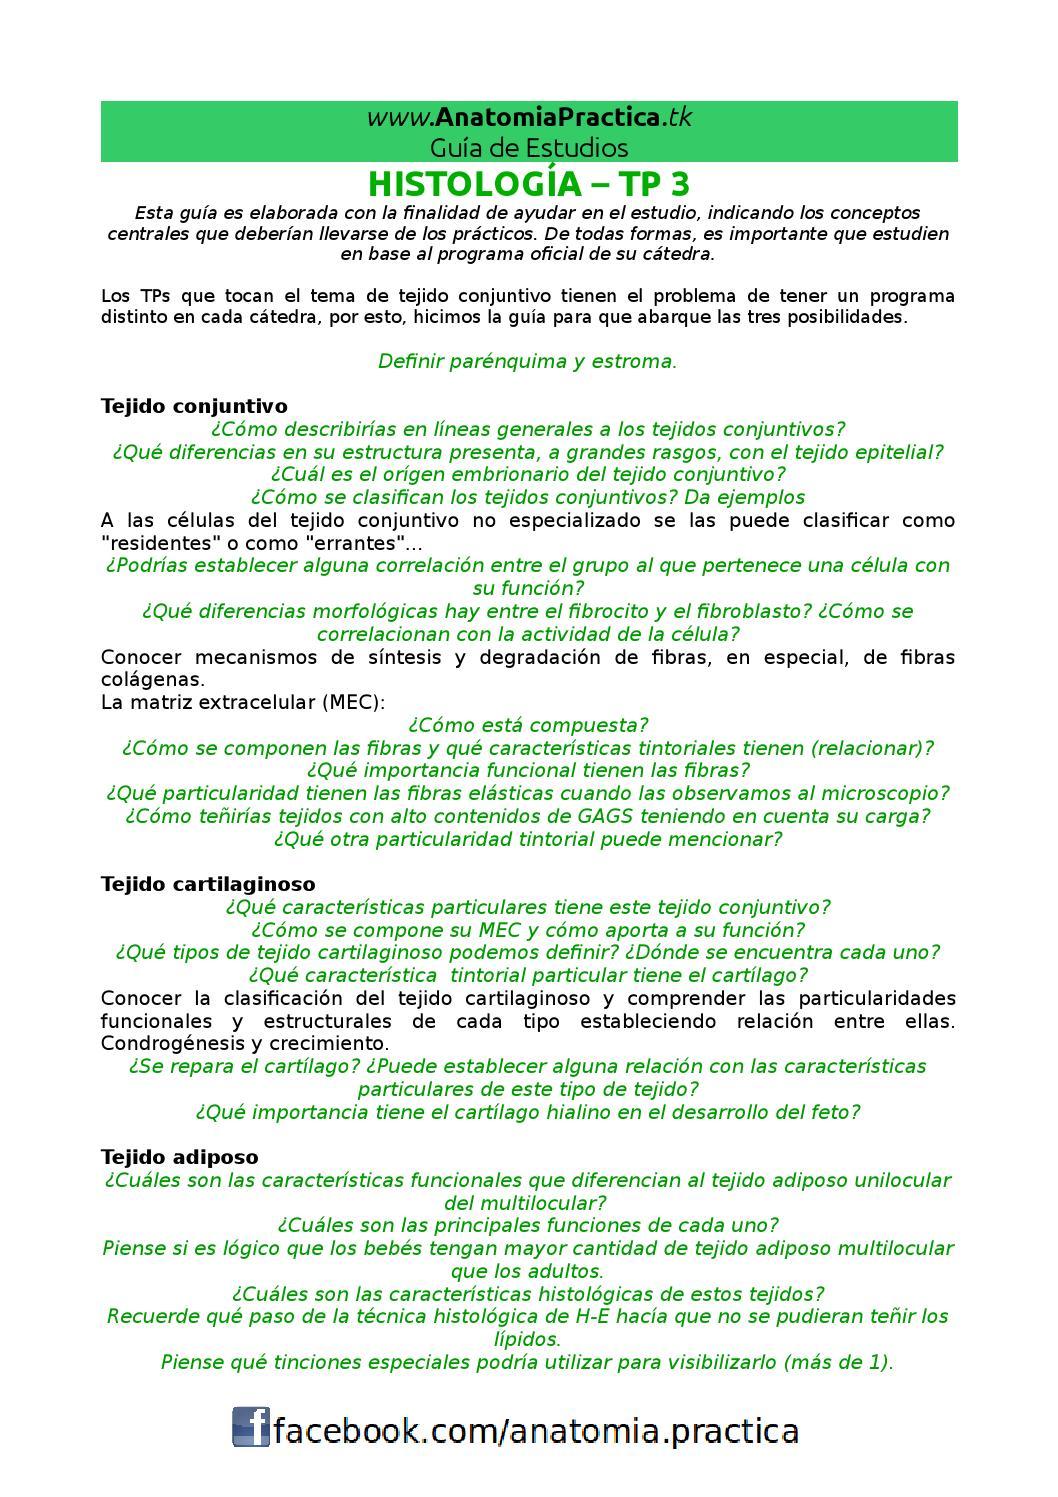 Histo - TP 3 by Anatomia Practica - issuu